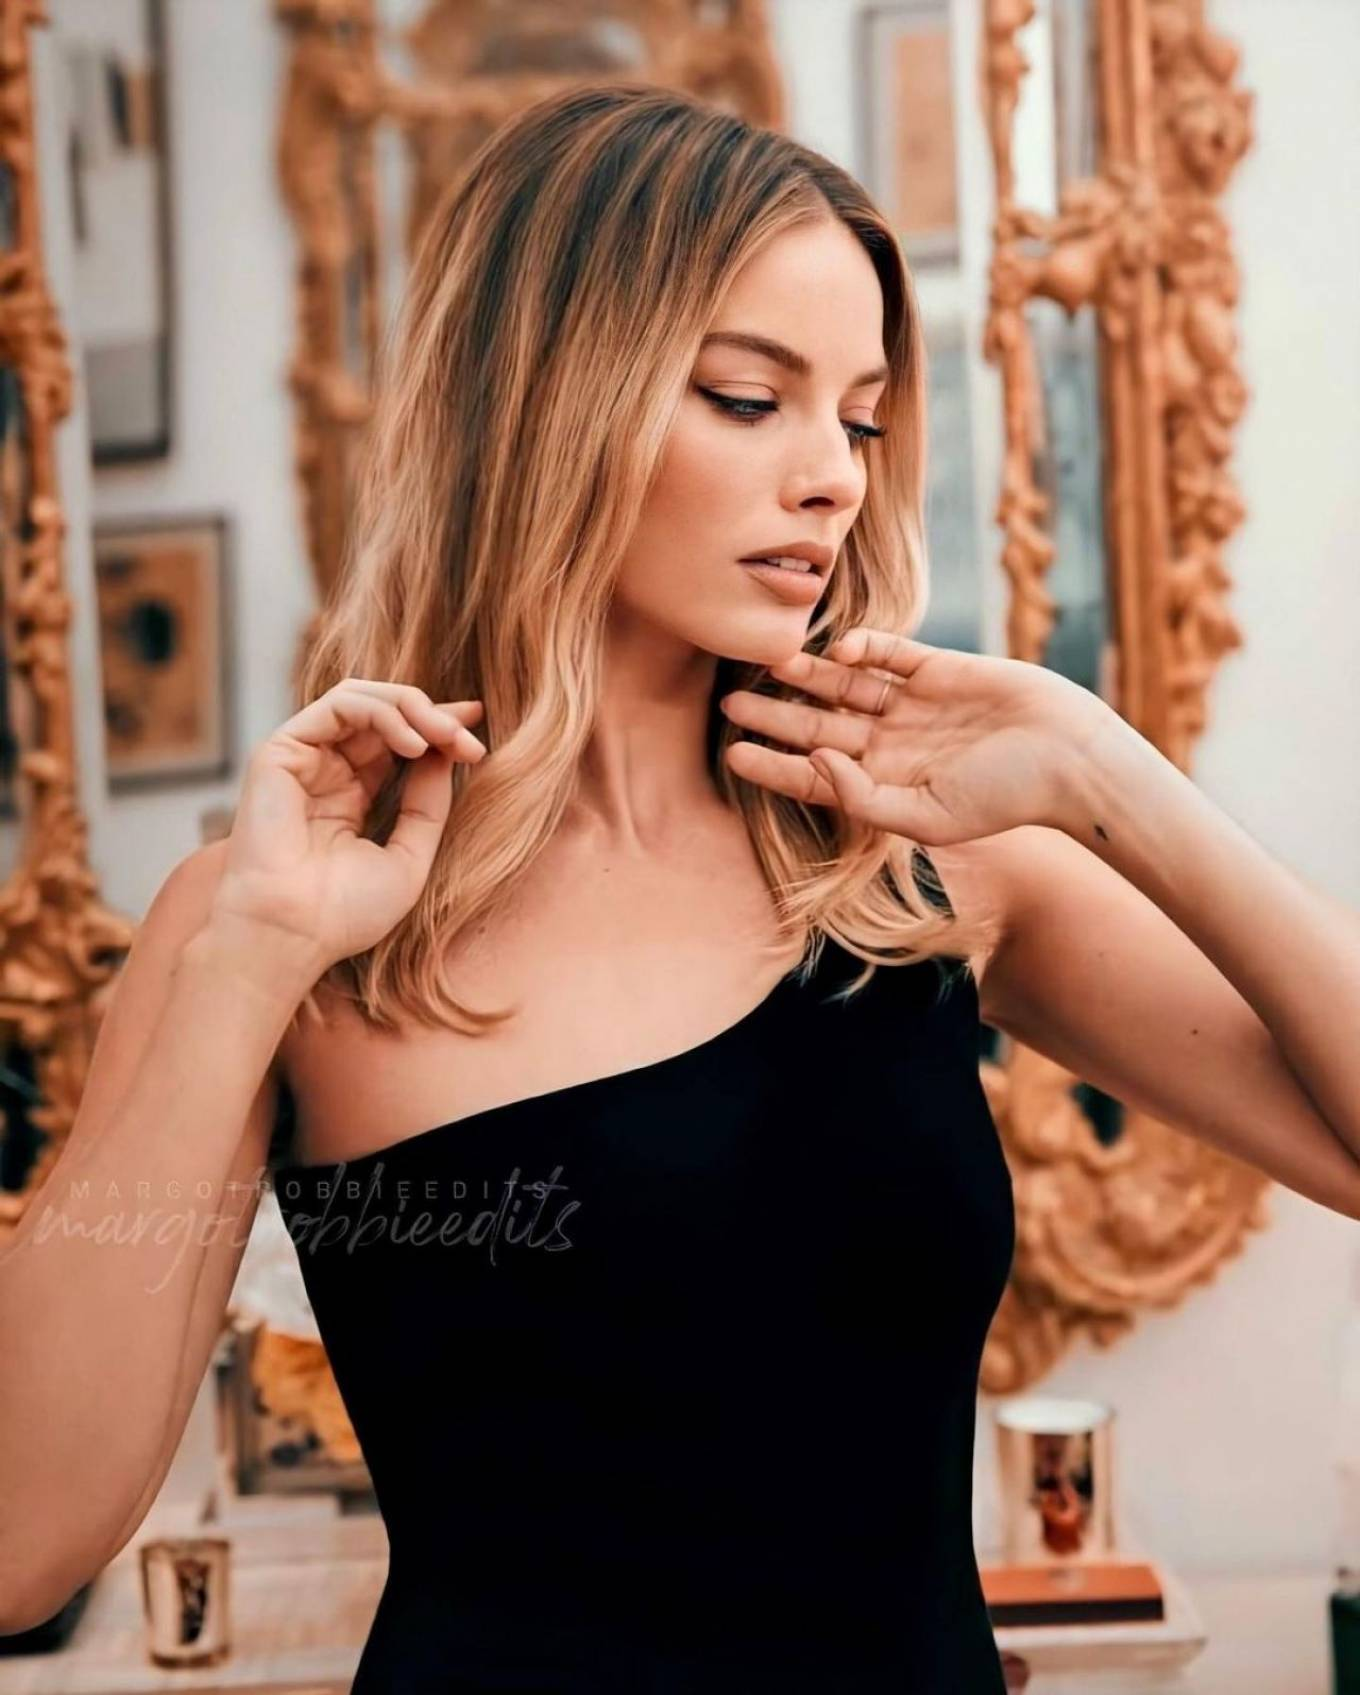 Margot Robbie 2020 : Margot Robbie – Sony Photoshoot 2020-02